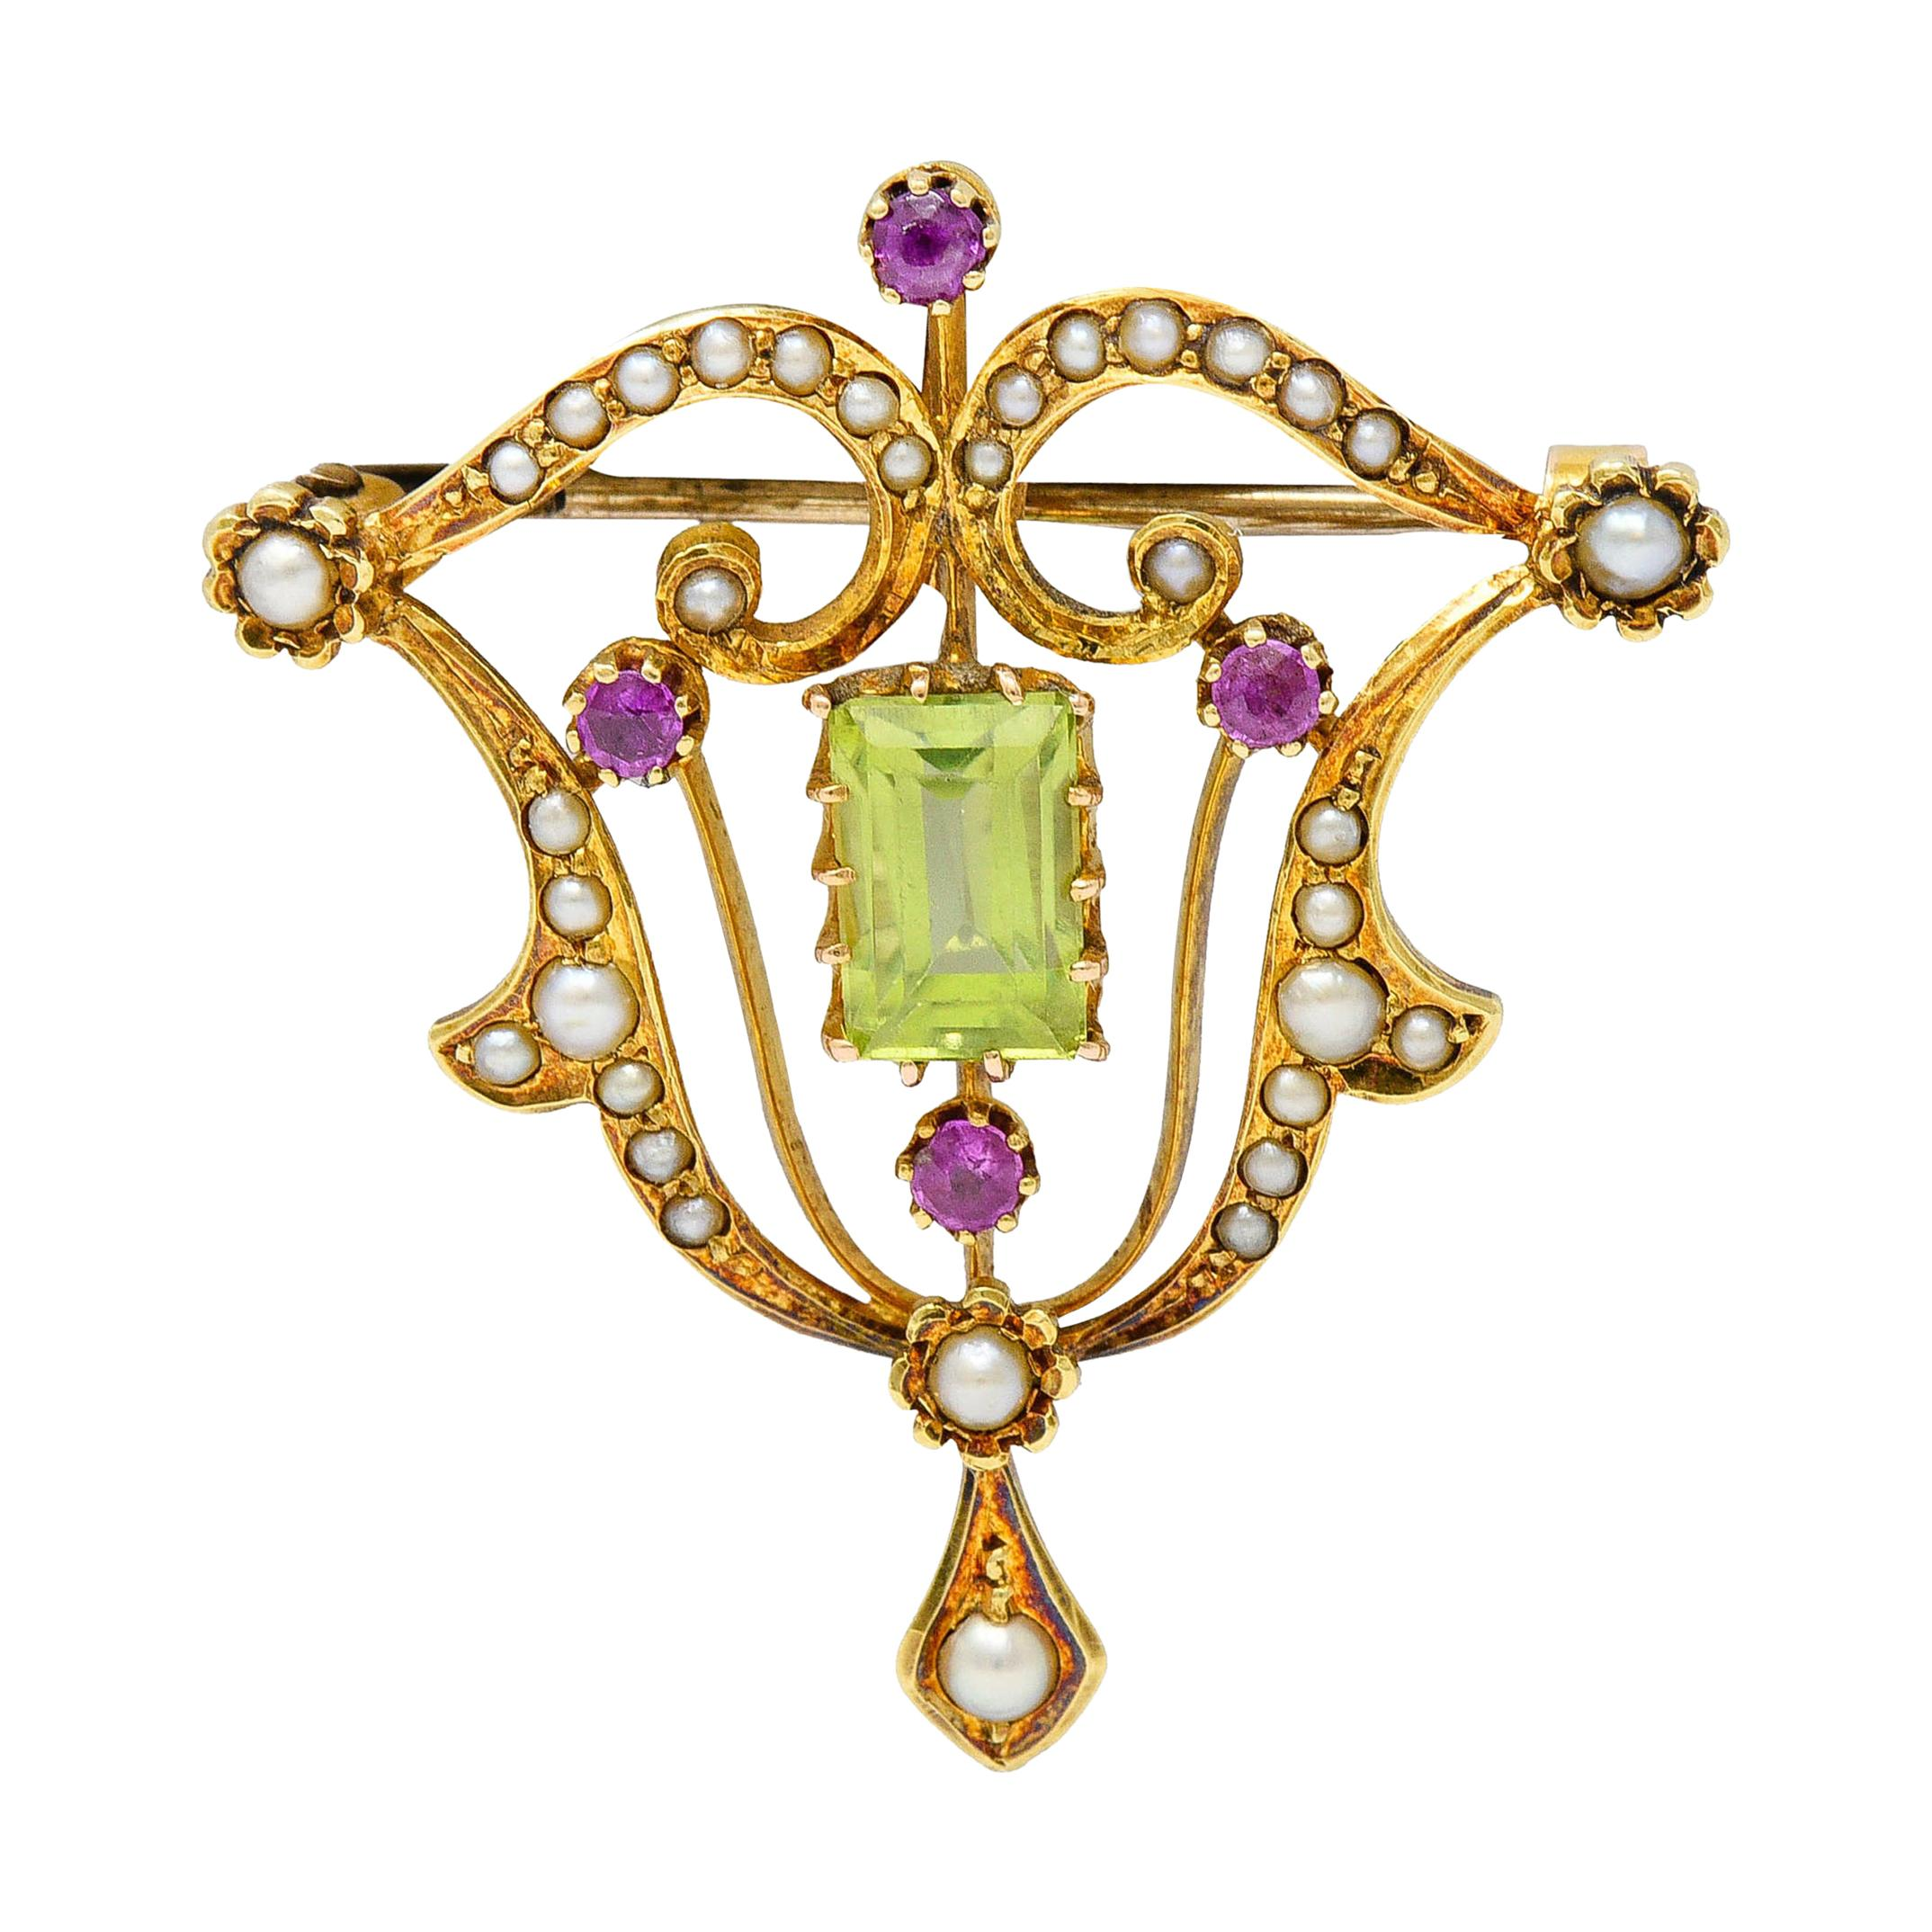 Art Nouveau 2.95 Carats Peridot Ruby Pearl 15 Karat Gold Pendant Brooch